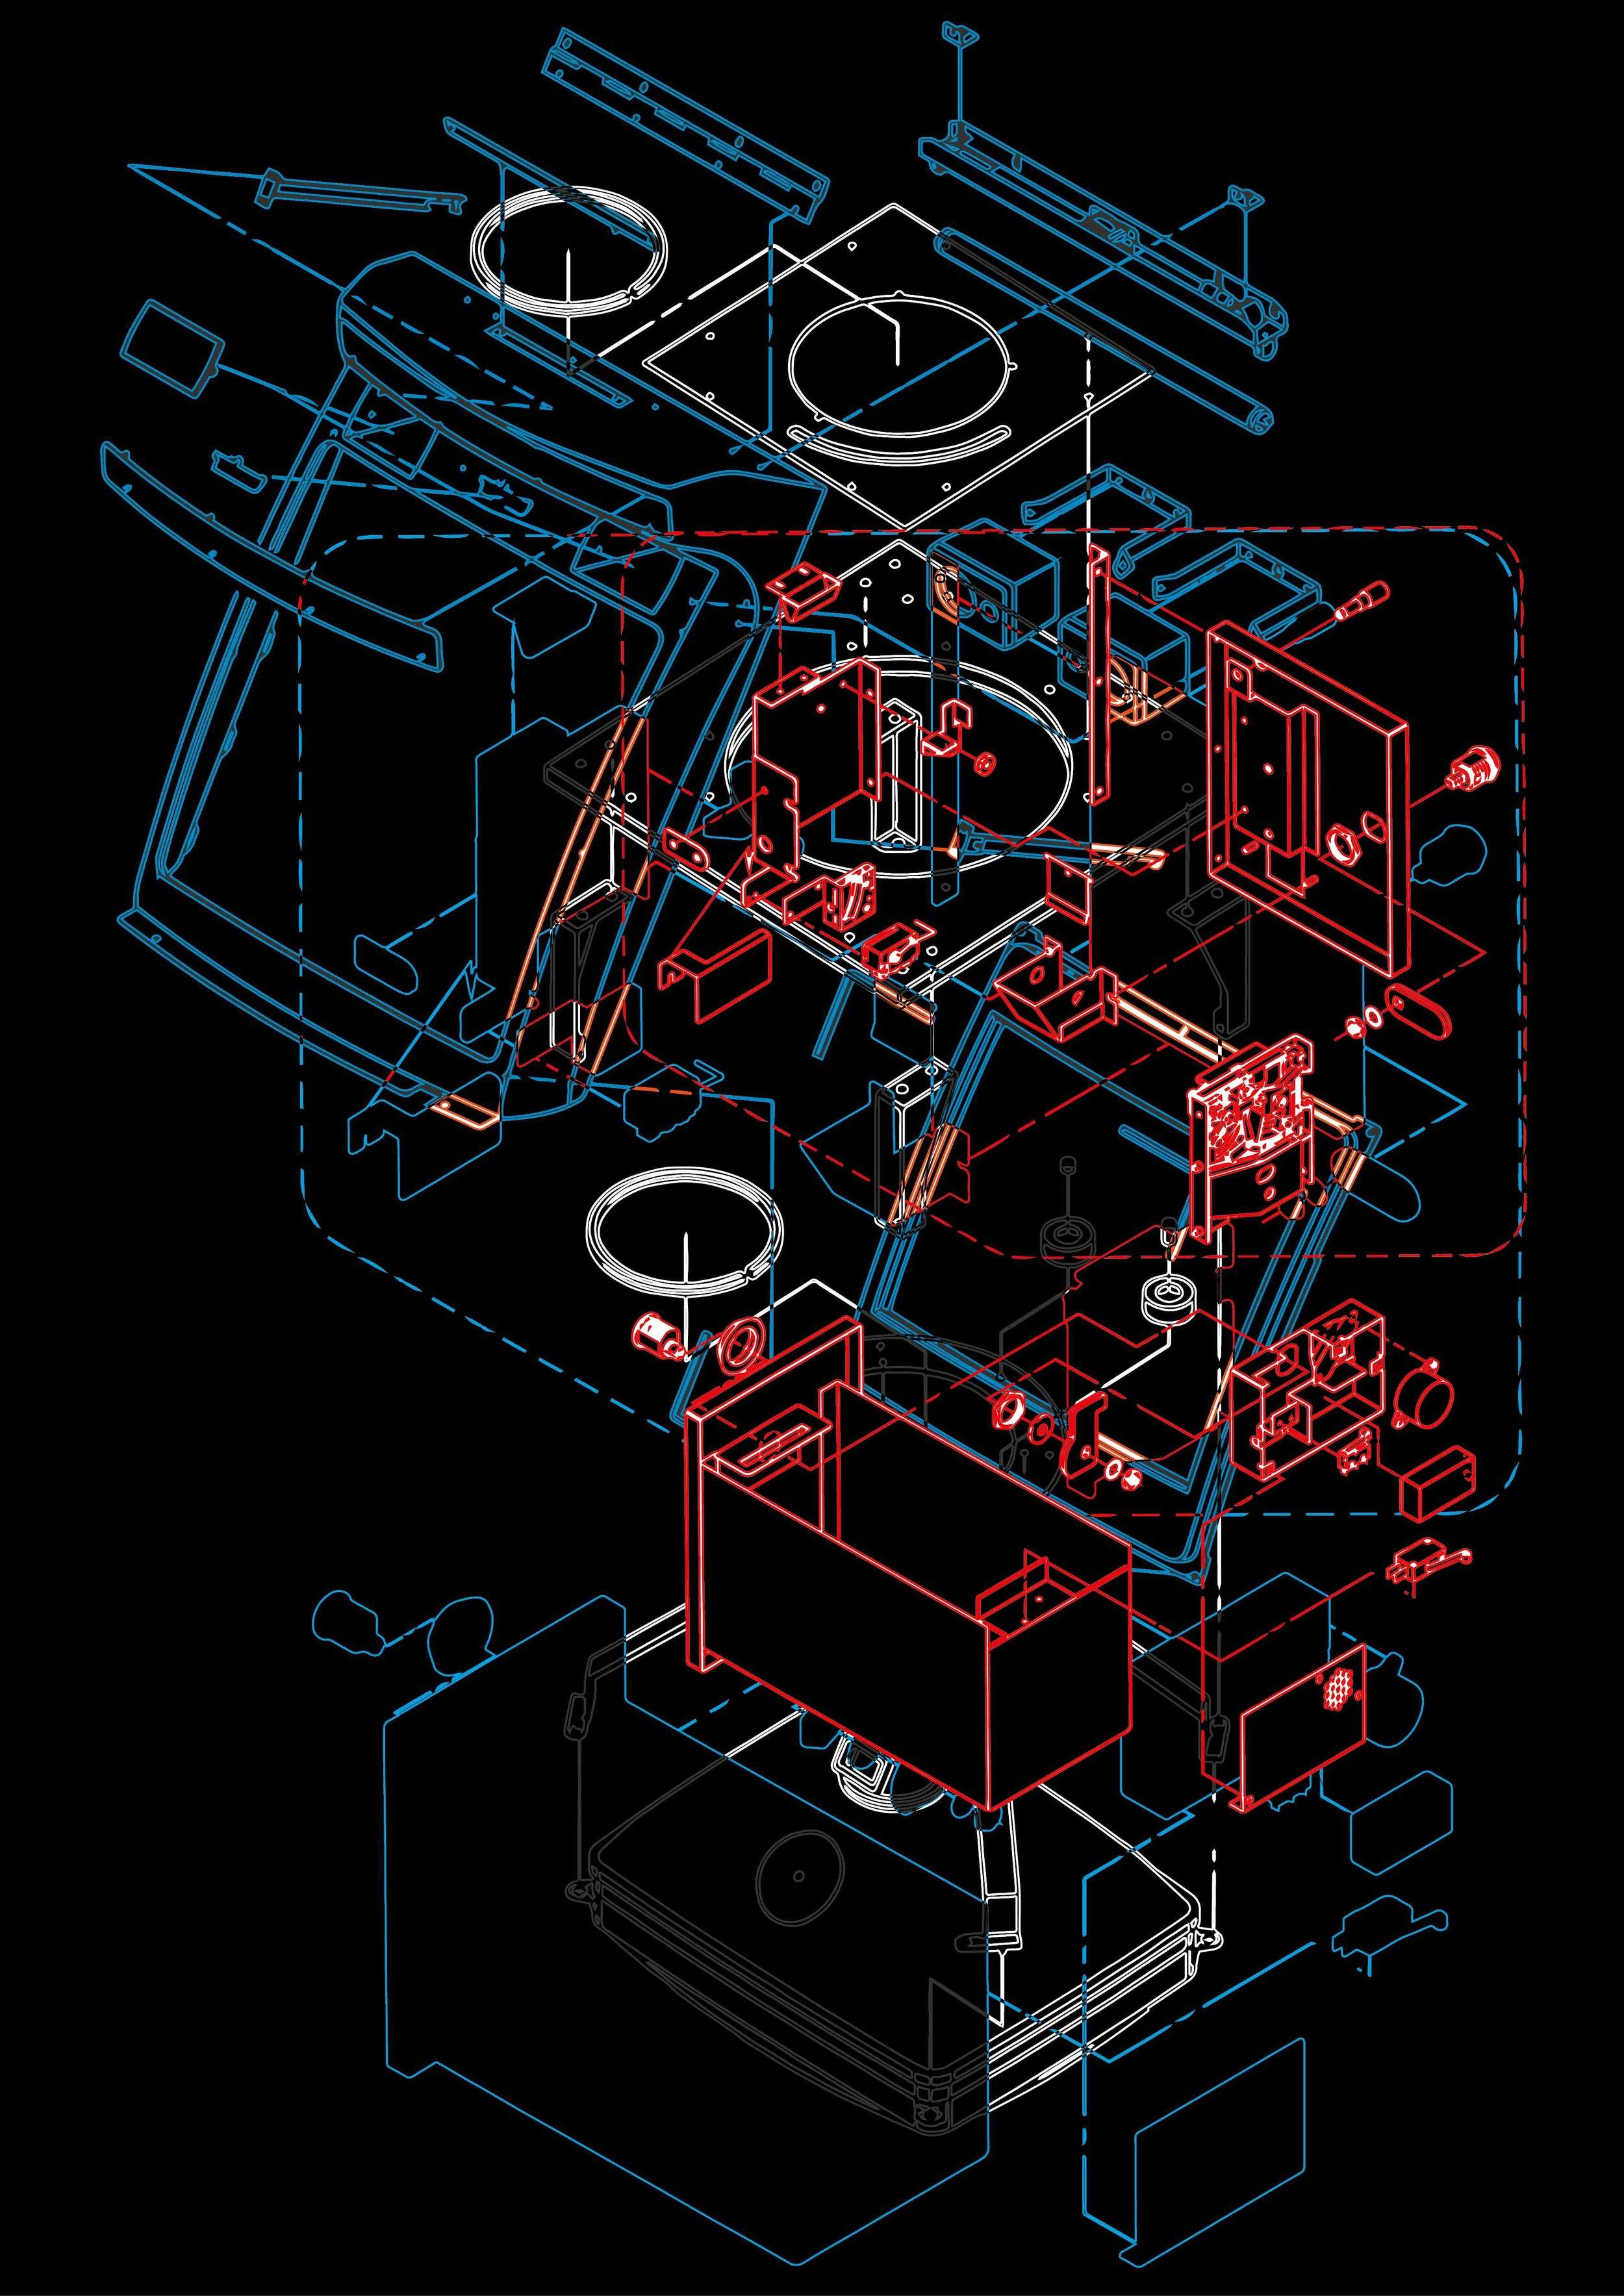 Blueprint1 - copie-01Small.jpg